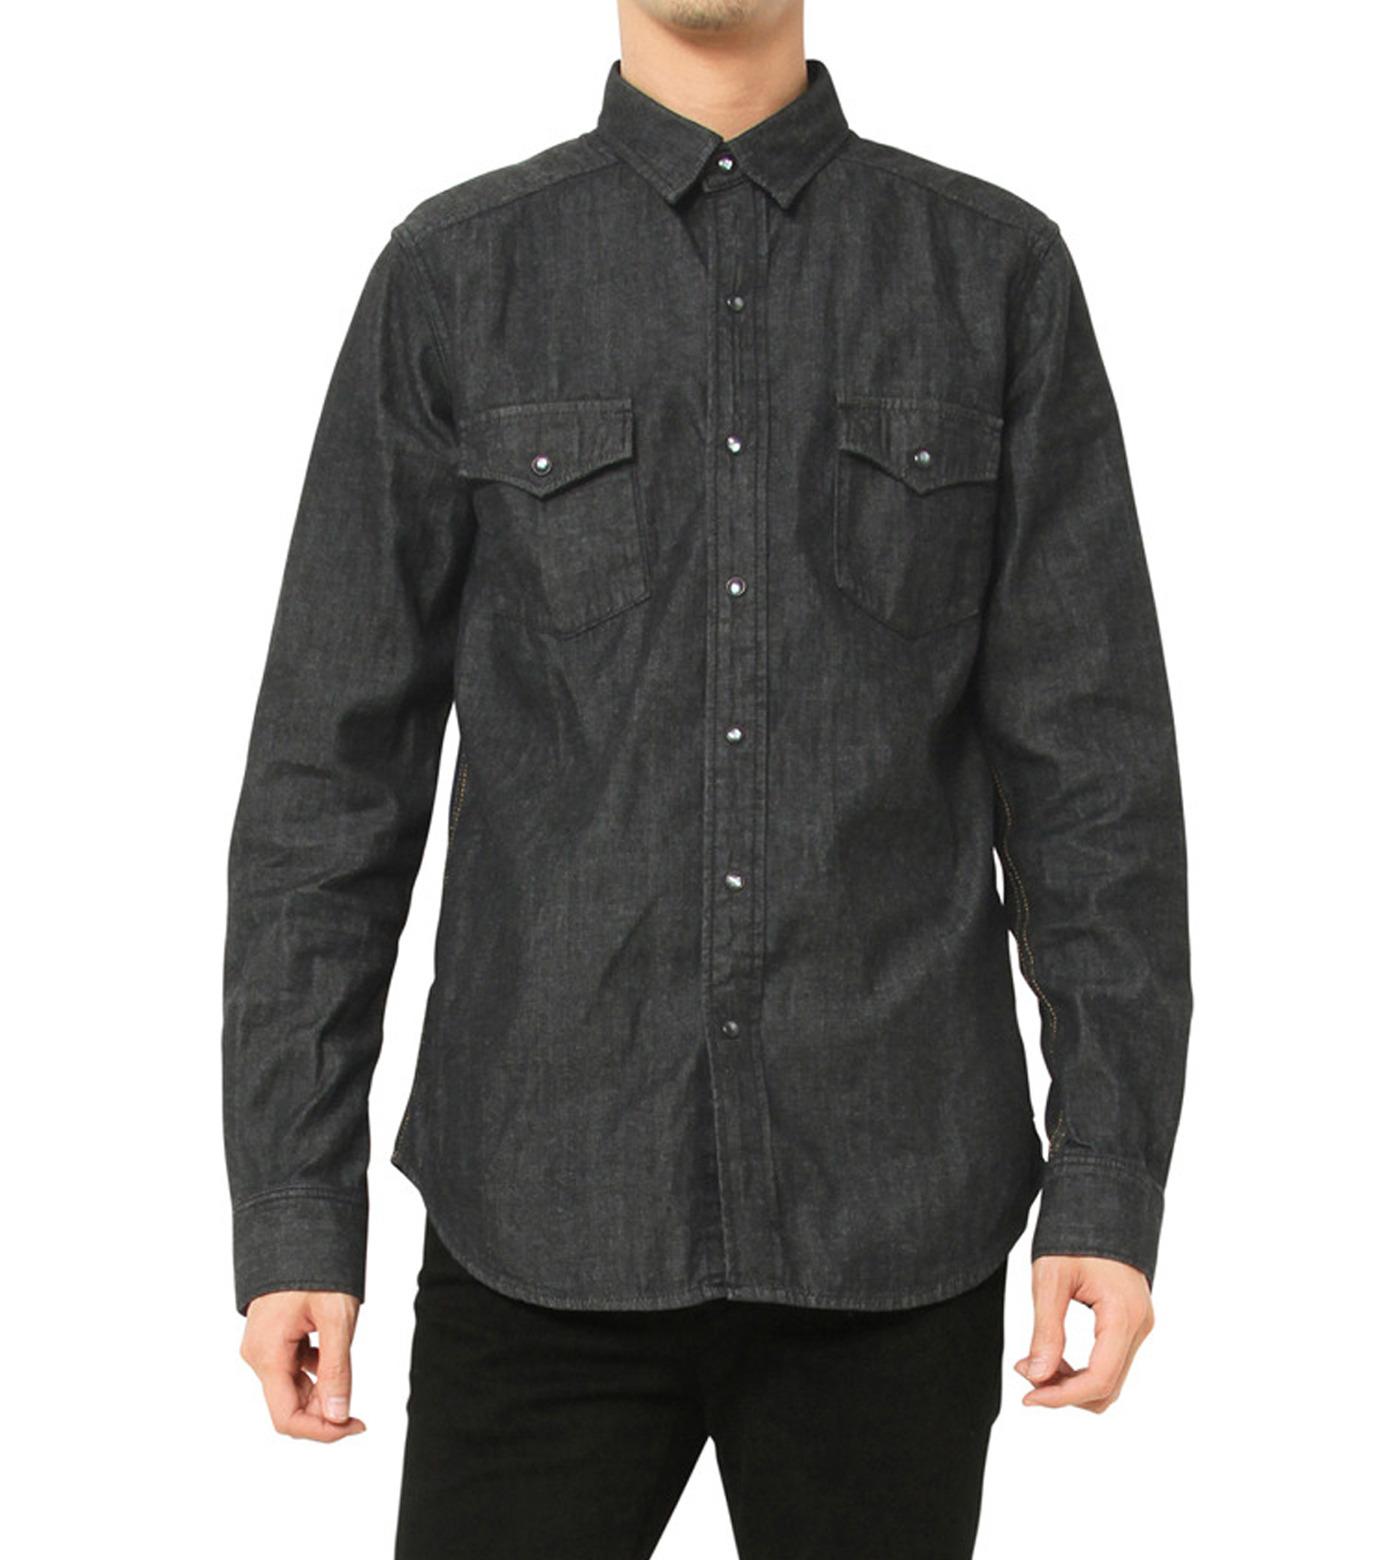 HL HEDDIE LOVU(エイチエル・エディールーヴ)のHL DENIM SHIRT-BLACK(シャツ/shirt)-17A93003-13 拡大詳細画像5